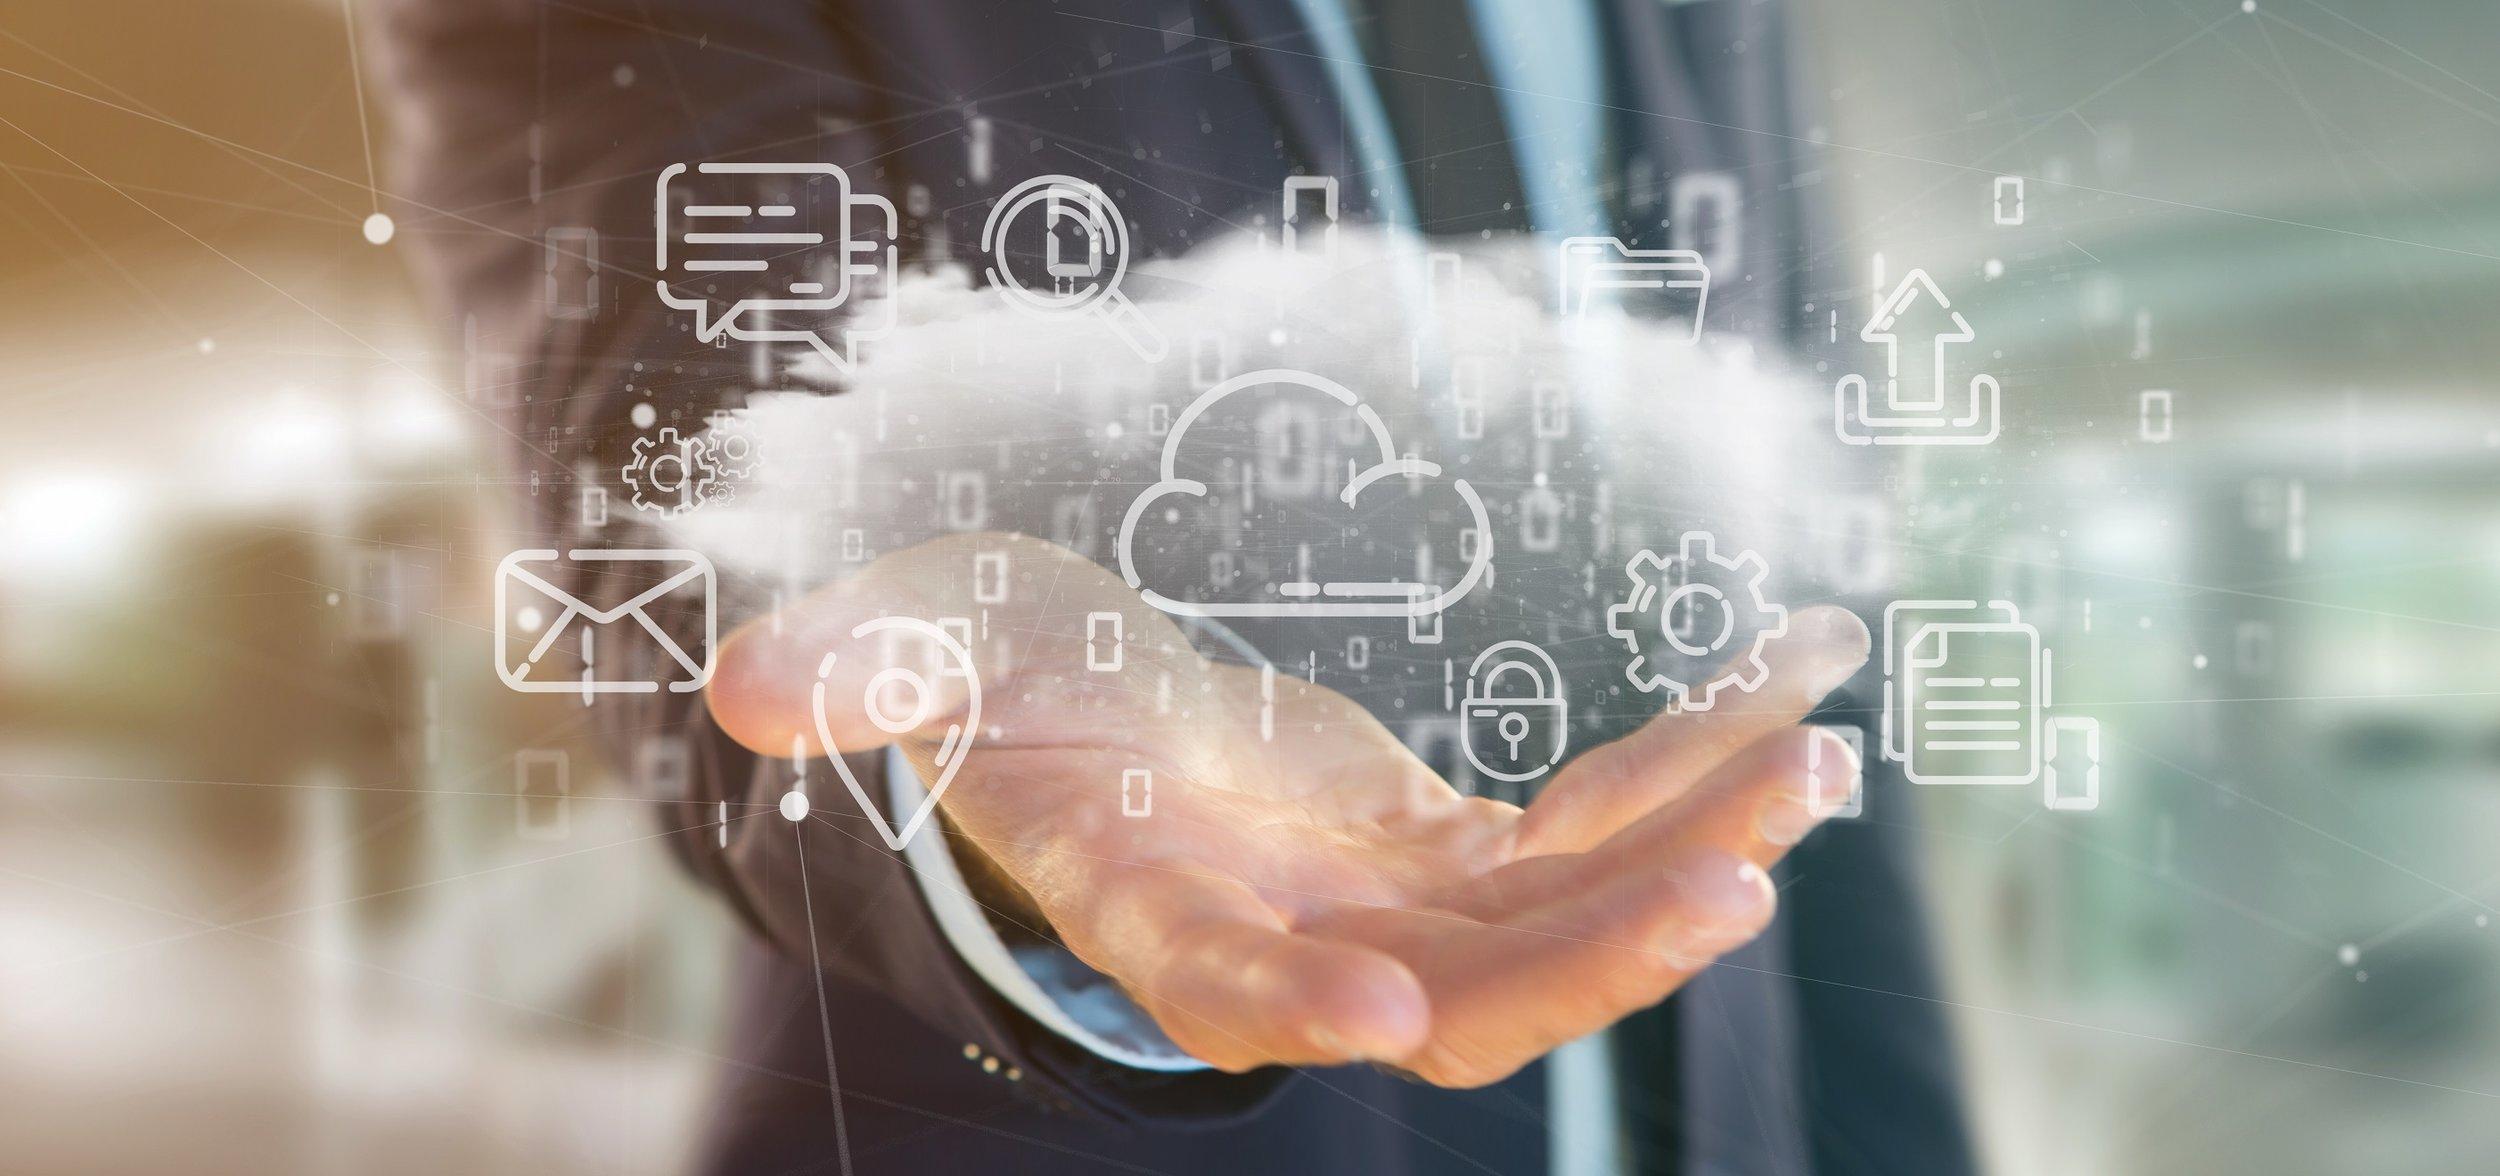 Live Data Acquisition into the Cloud